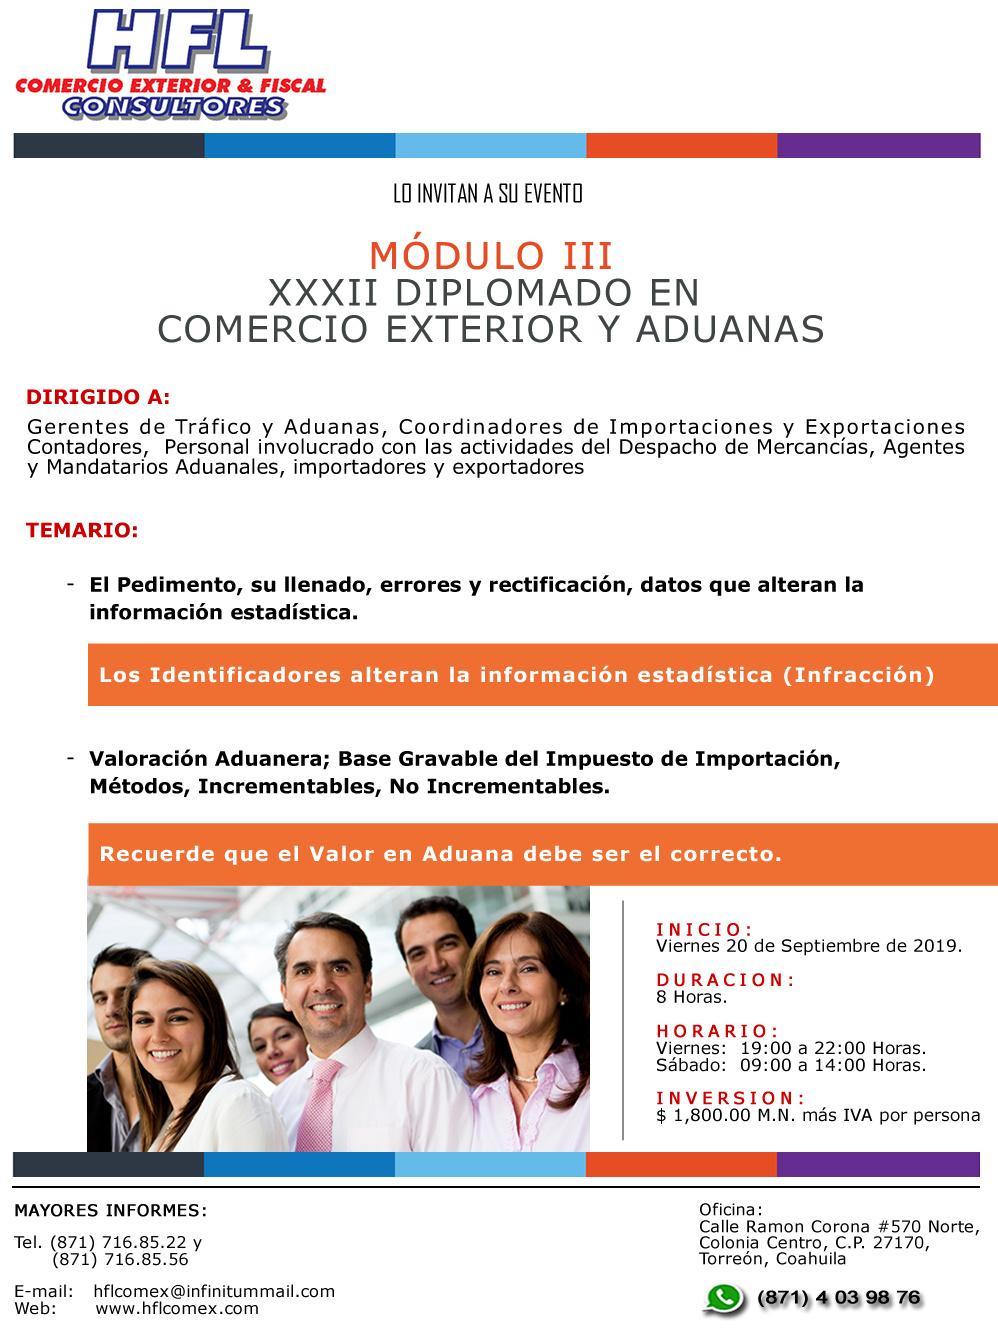 https://0201.nccdn.net/1_2/000/000/176/390/MODULO-III-DIPLOMADO--1--2018.fw-998x1328.jpg